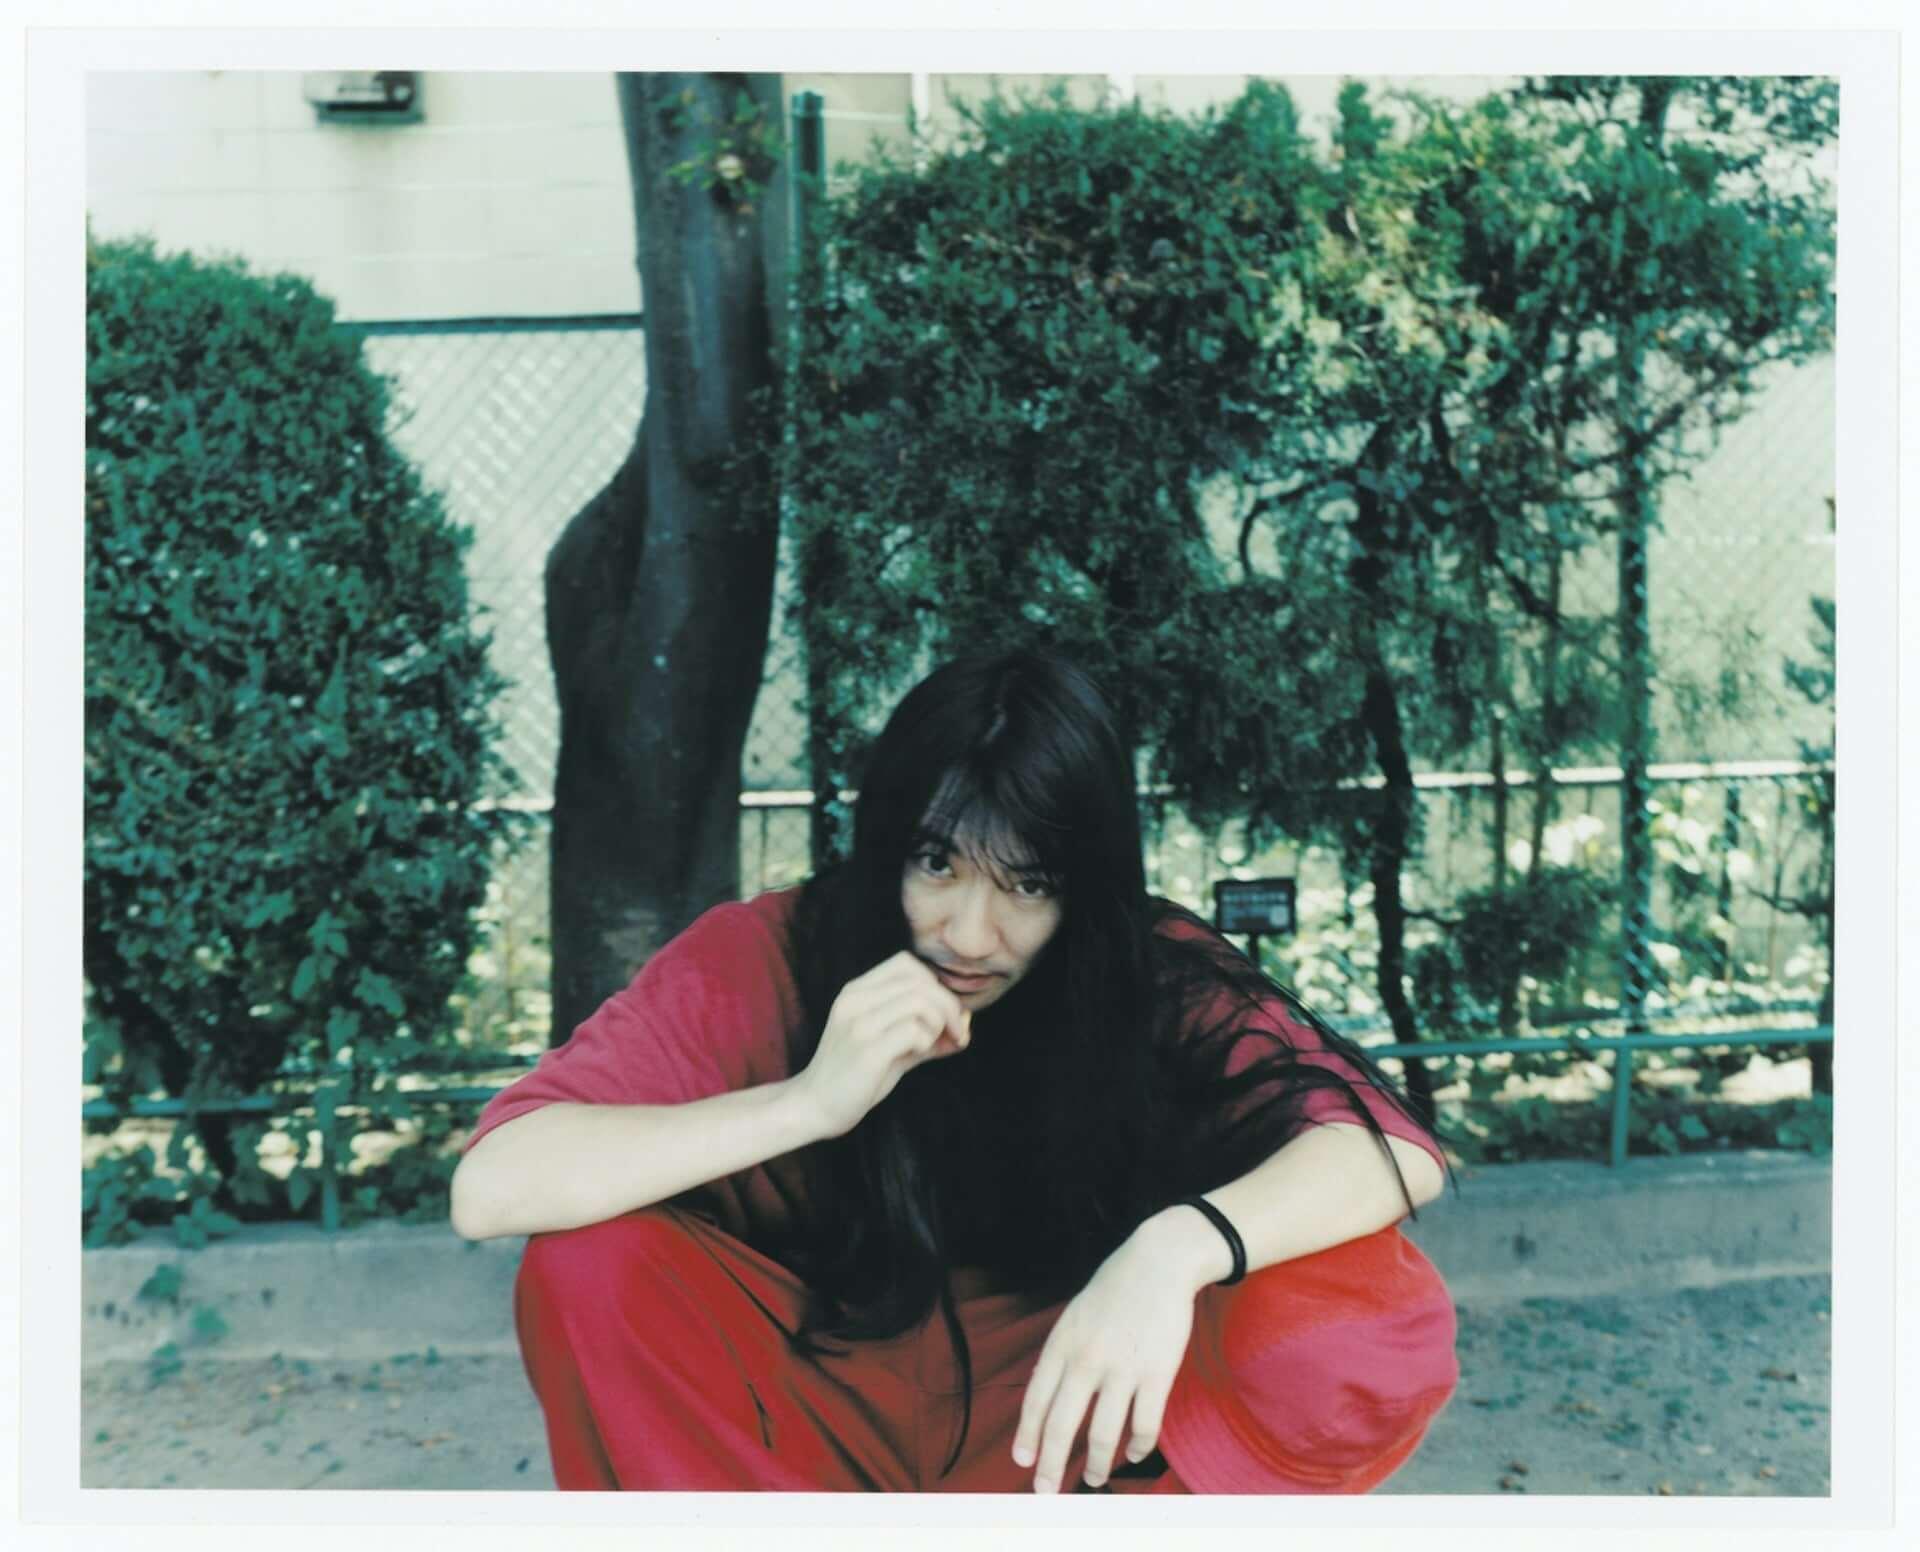 GEZANのマヒトゥ・ザ・ピーポーが初のエッセイ集『ひかりぼっち』を発売決定!刊行記念トークショーには佐内正史、燃え殻も参加 art201016_hikaribocchi_2-1920x1552